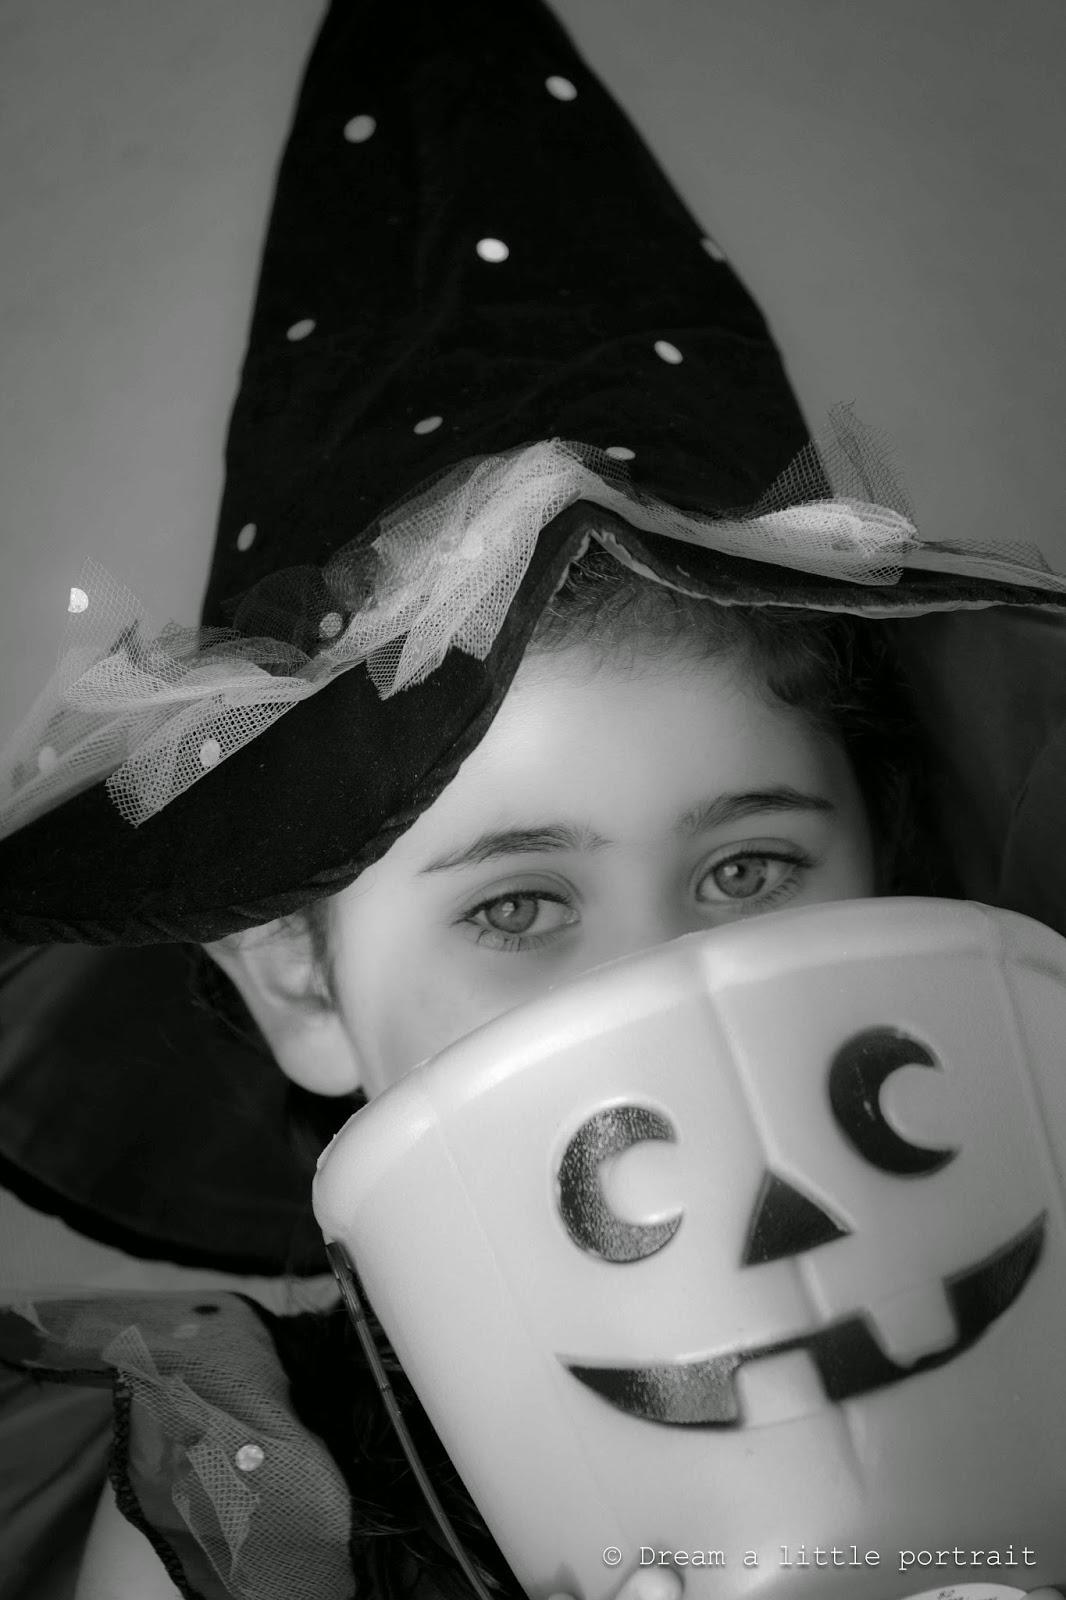 Halloween Shoot by Dream a little portrait